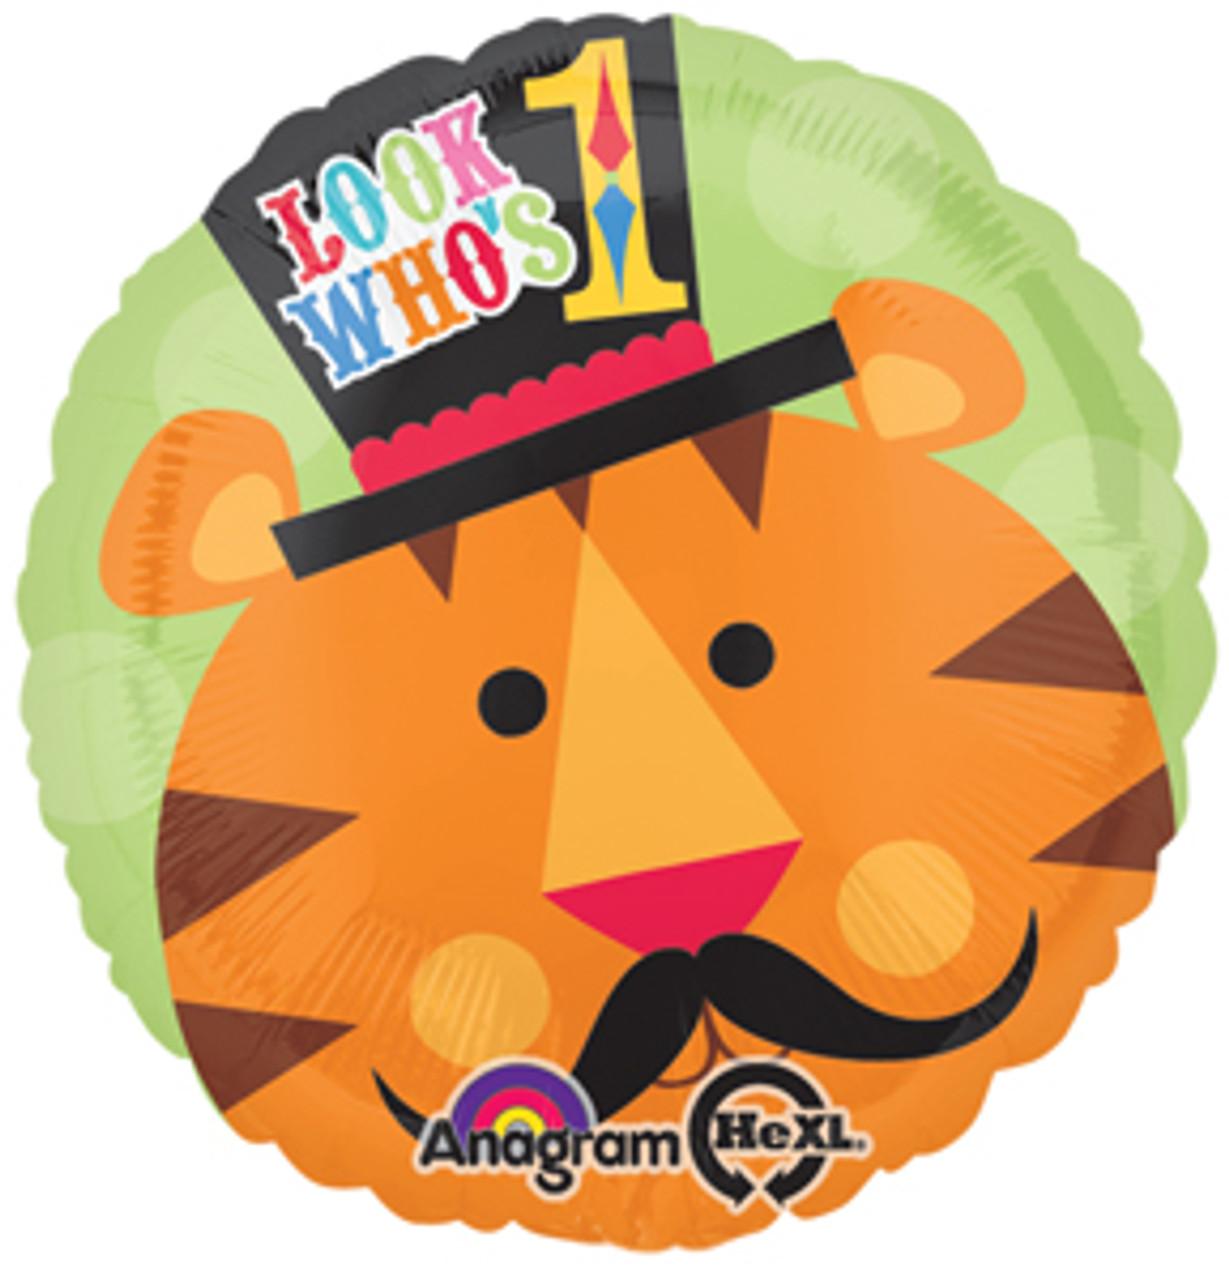 17 Fisher Price Circus Tiger 1st Birthday Balloon Mtrade Pte Ltd